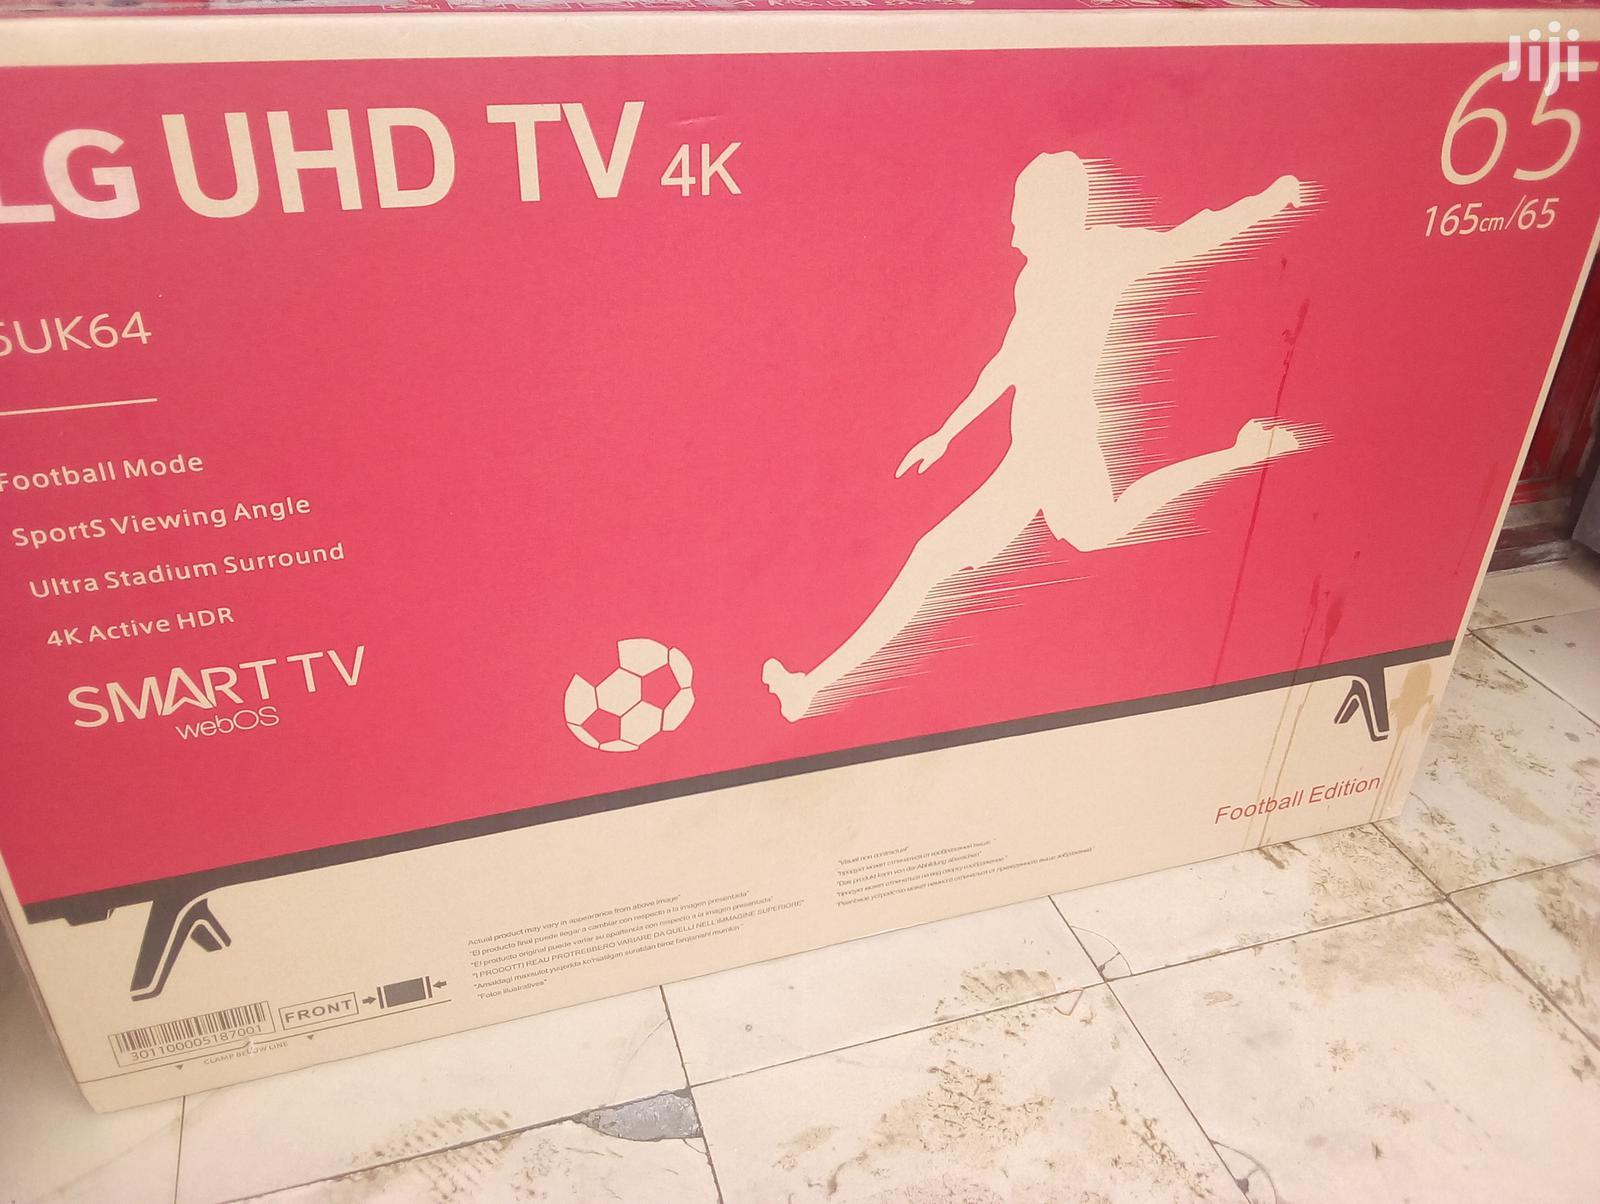 LG Uhd Hdmi Smart Led 4k Televisions 65 Inches